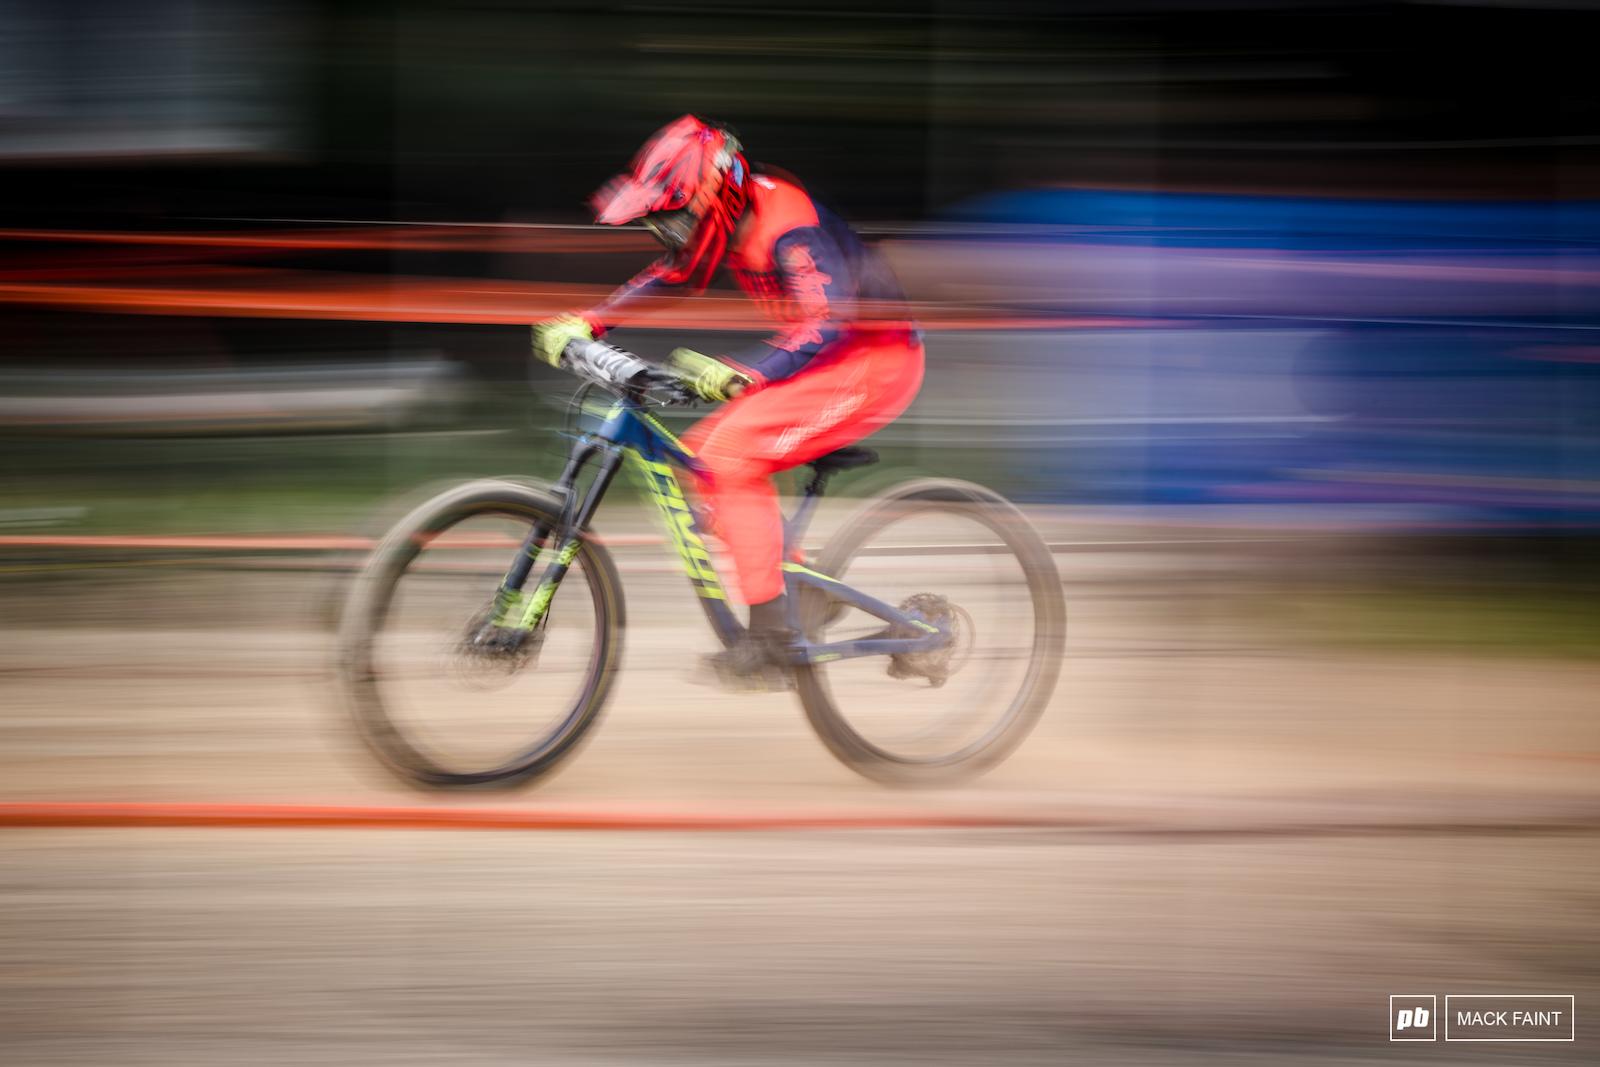 Sprinting through the finish.